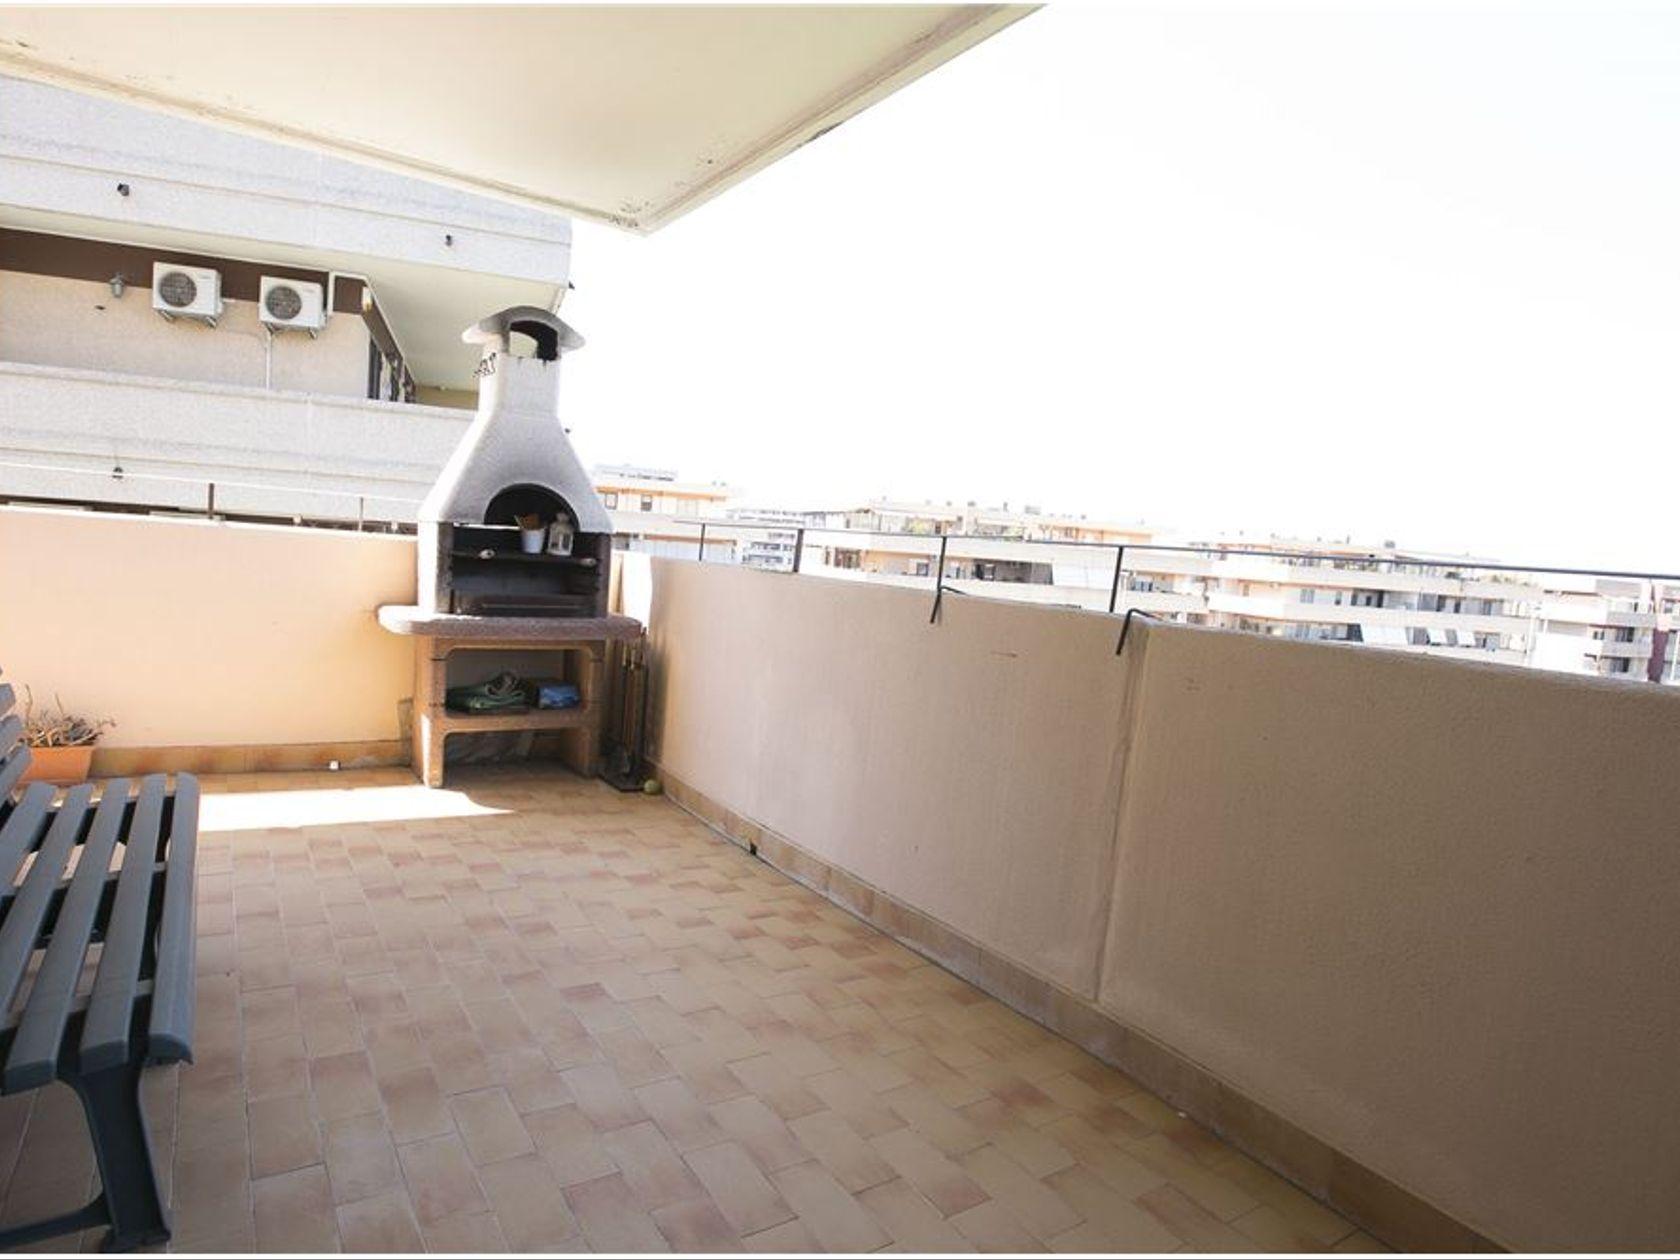 Appartamento Roma-acilia Vitinia Infernetto Axa Casal Palocco, Roma, RM Vendita - Foto 13